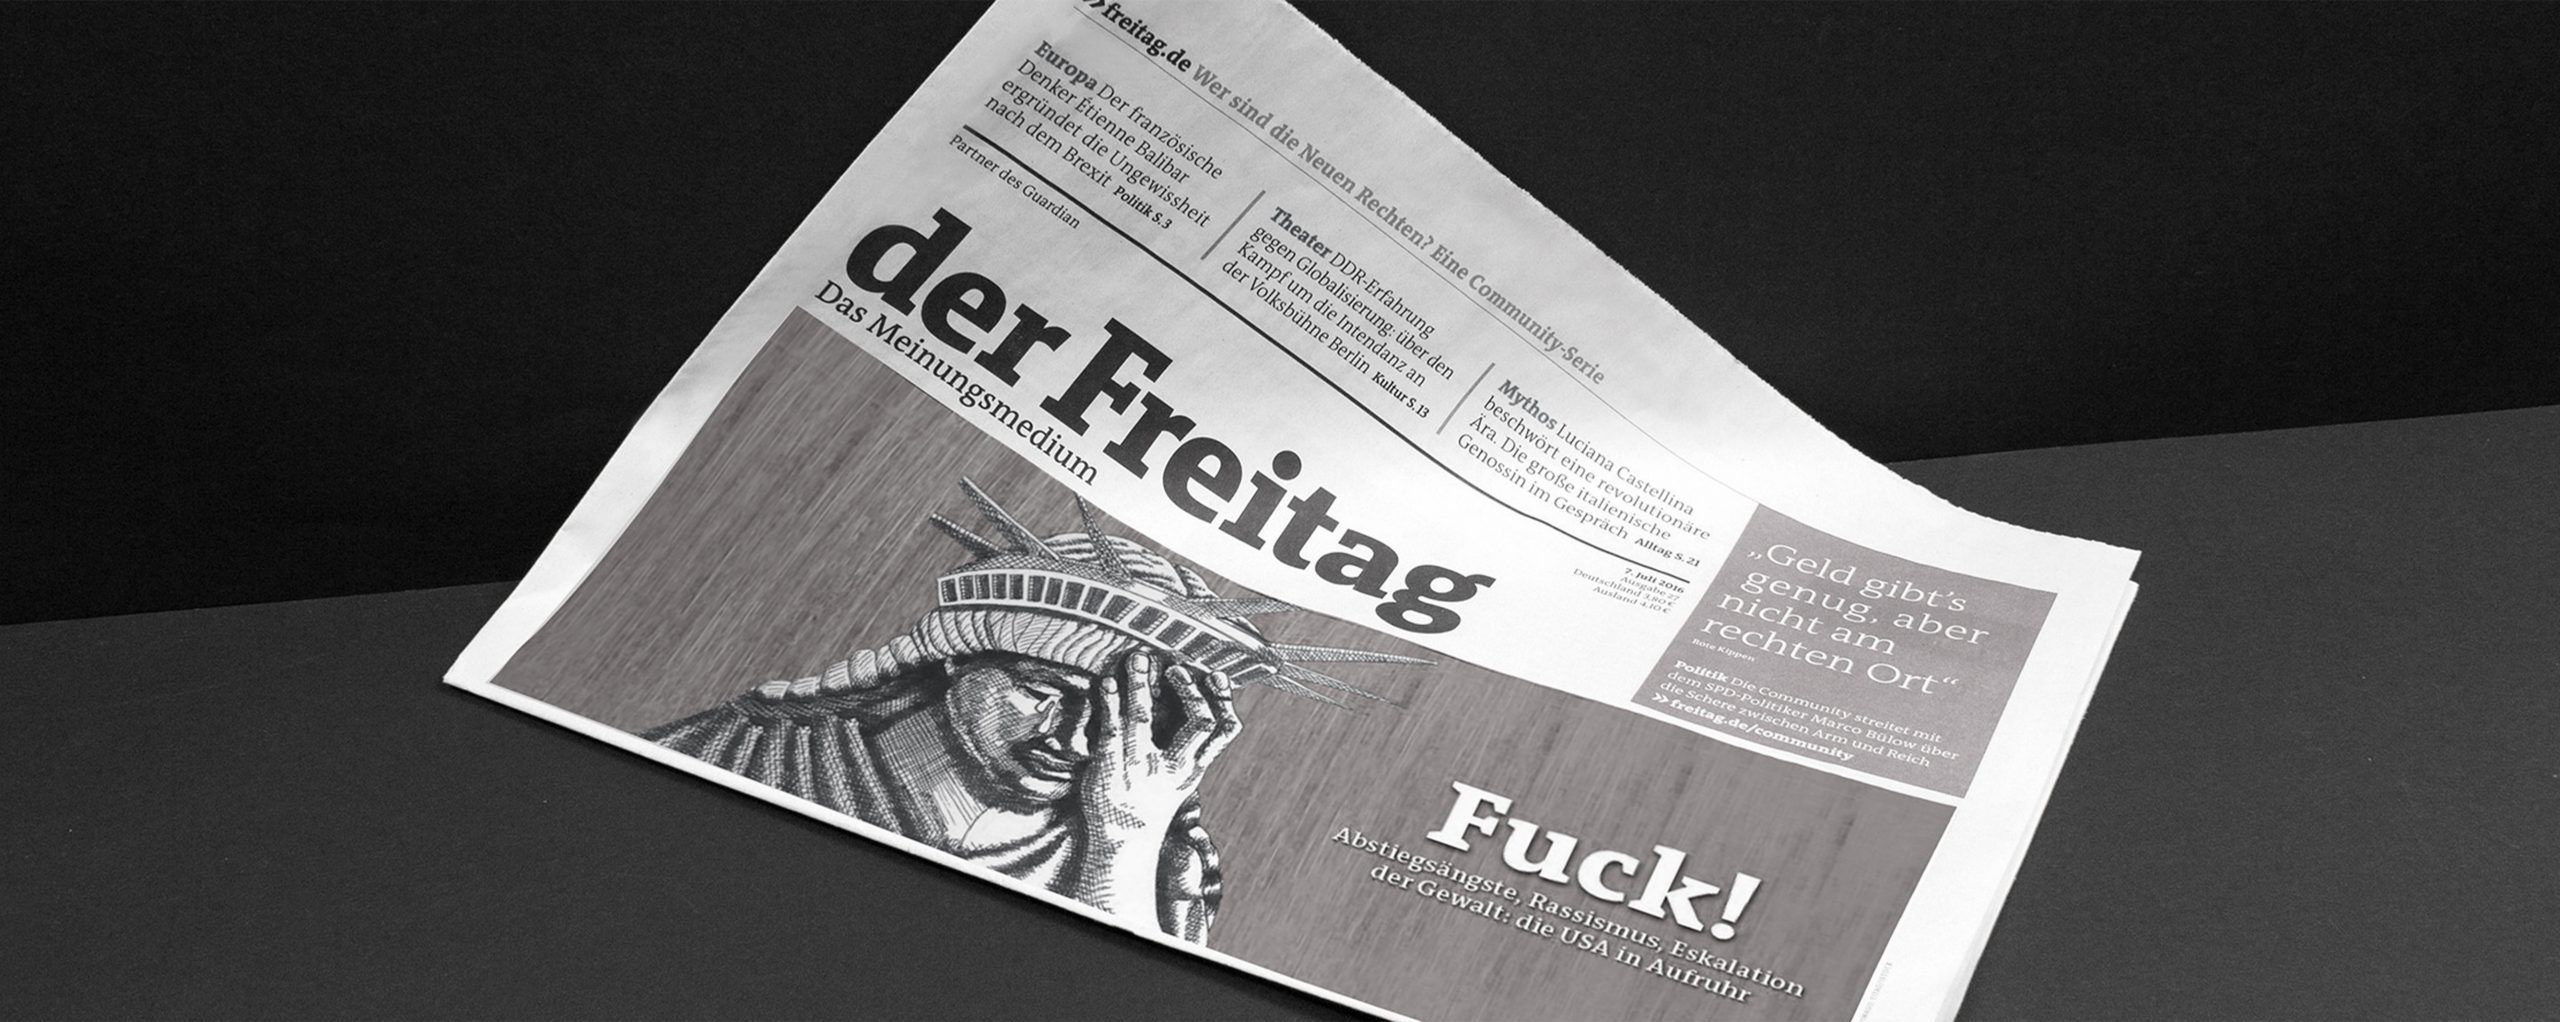 Studio Last - Der Freitag – Newspaper